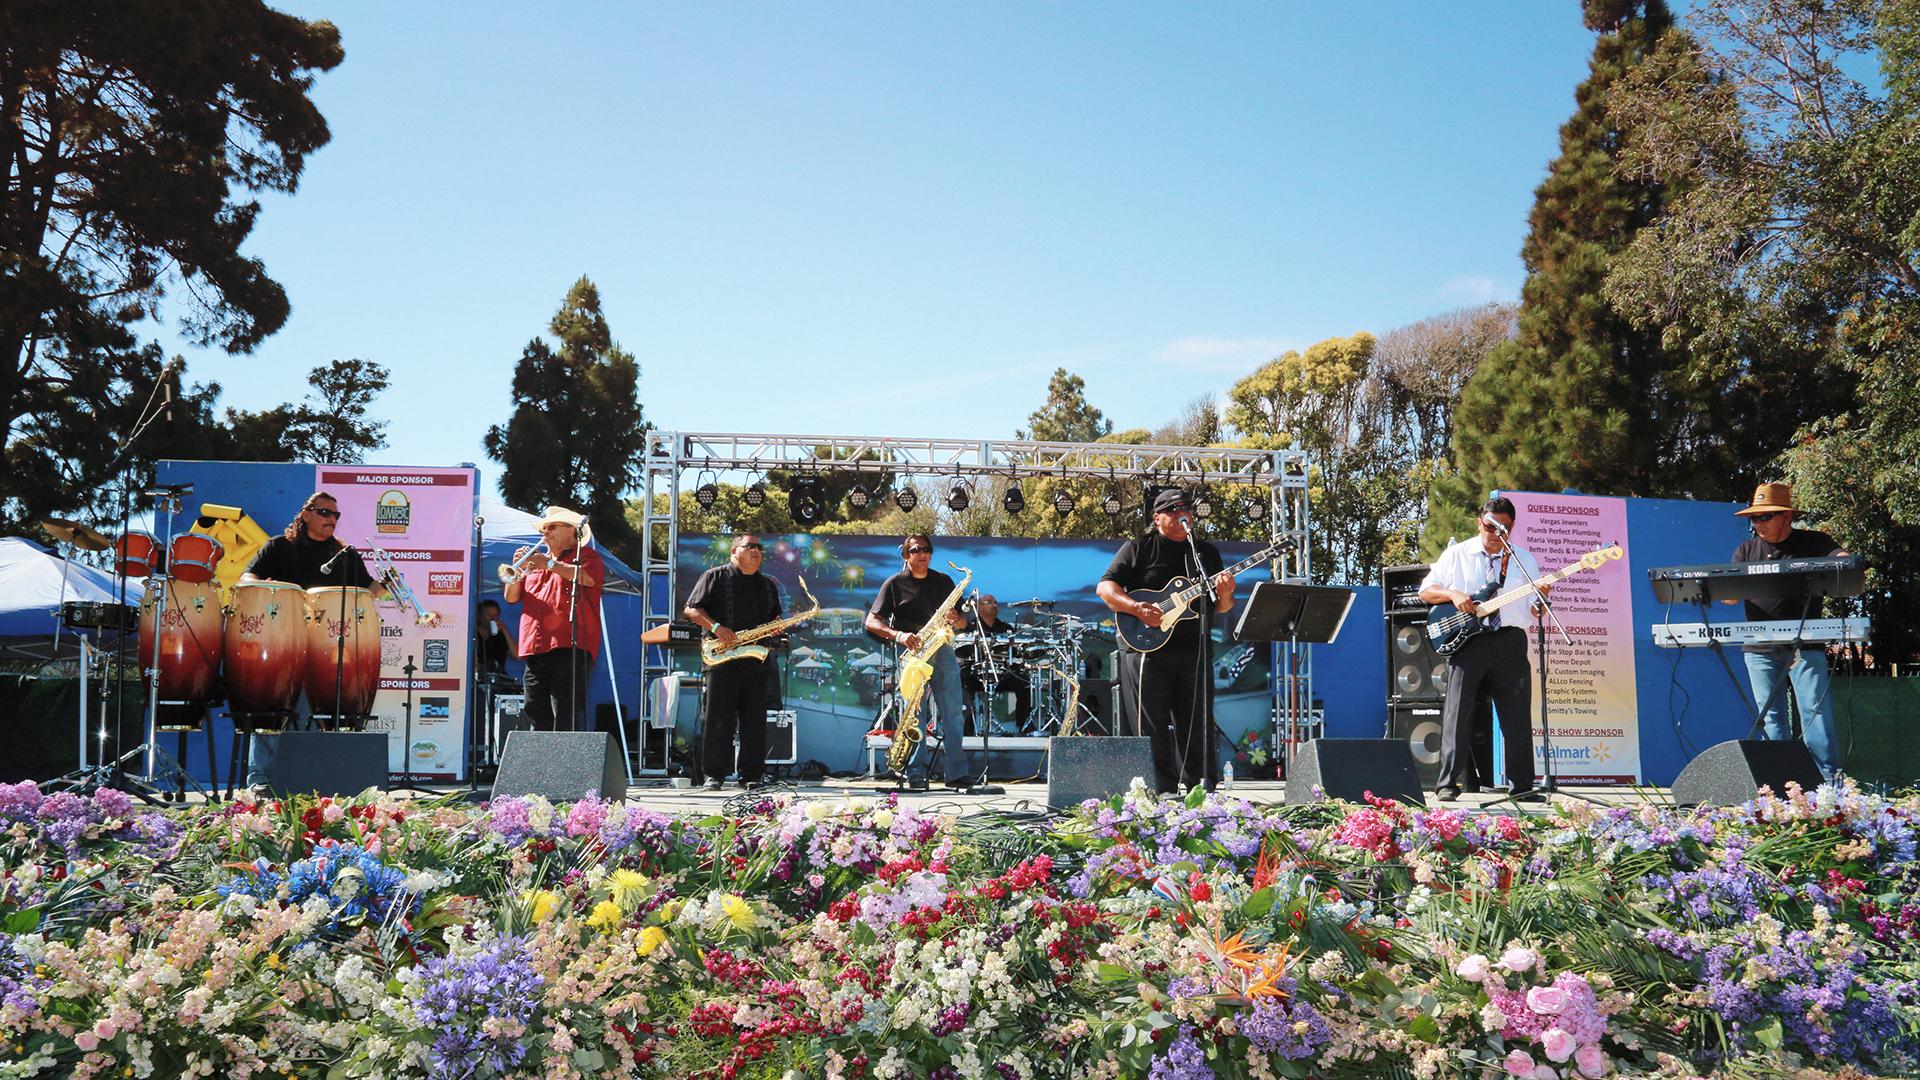 Lompoc Flower Festival 2020   Lompoc Events Calendar 1920x1080